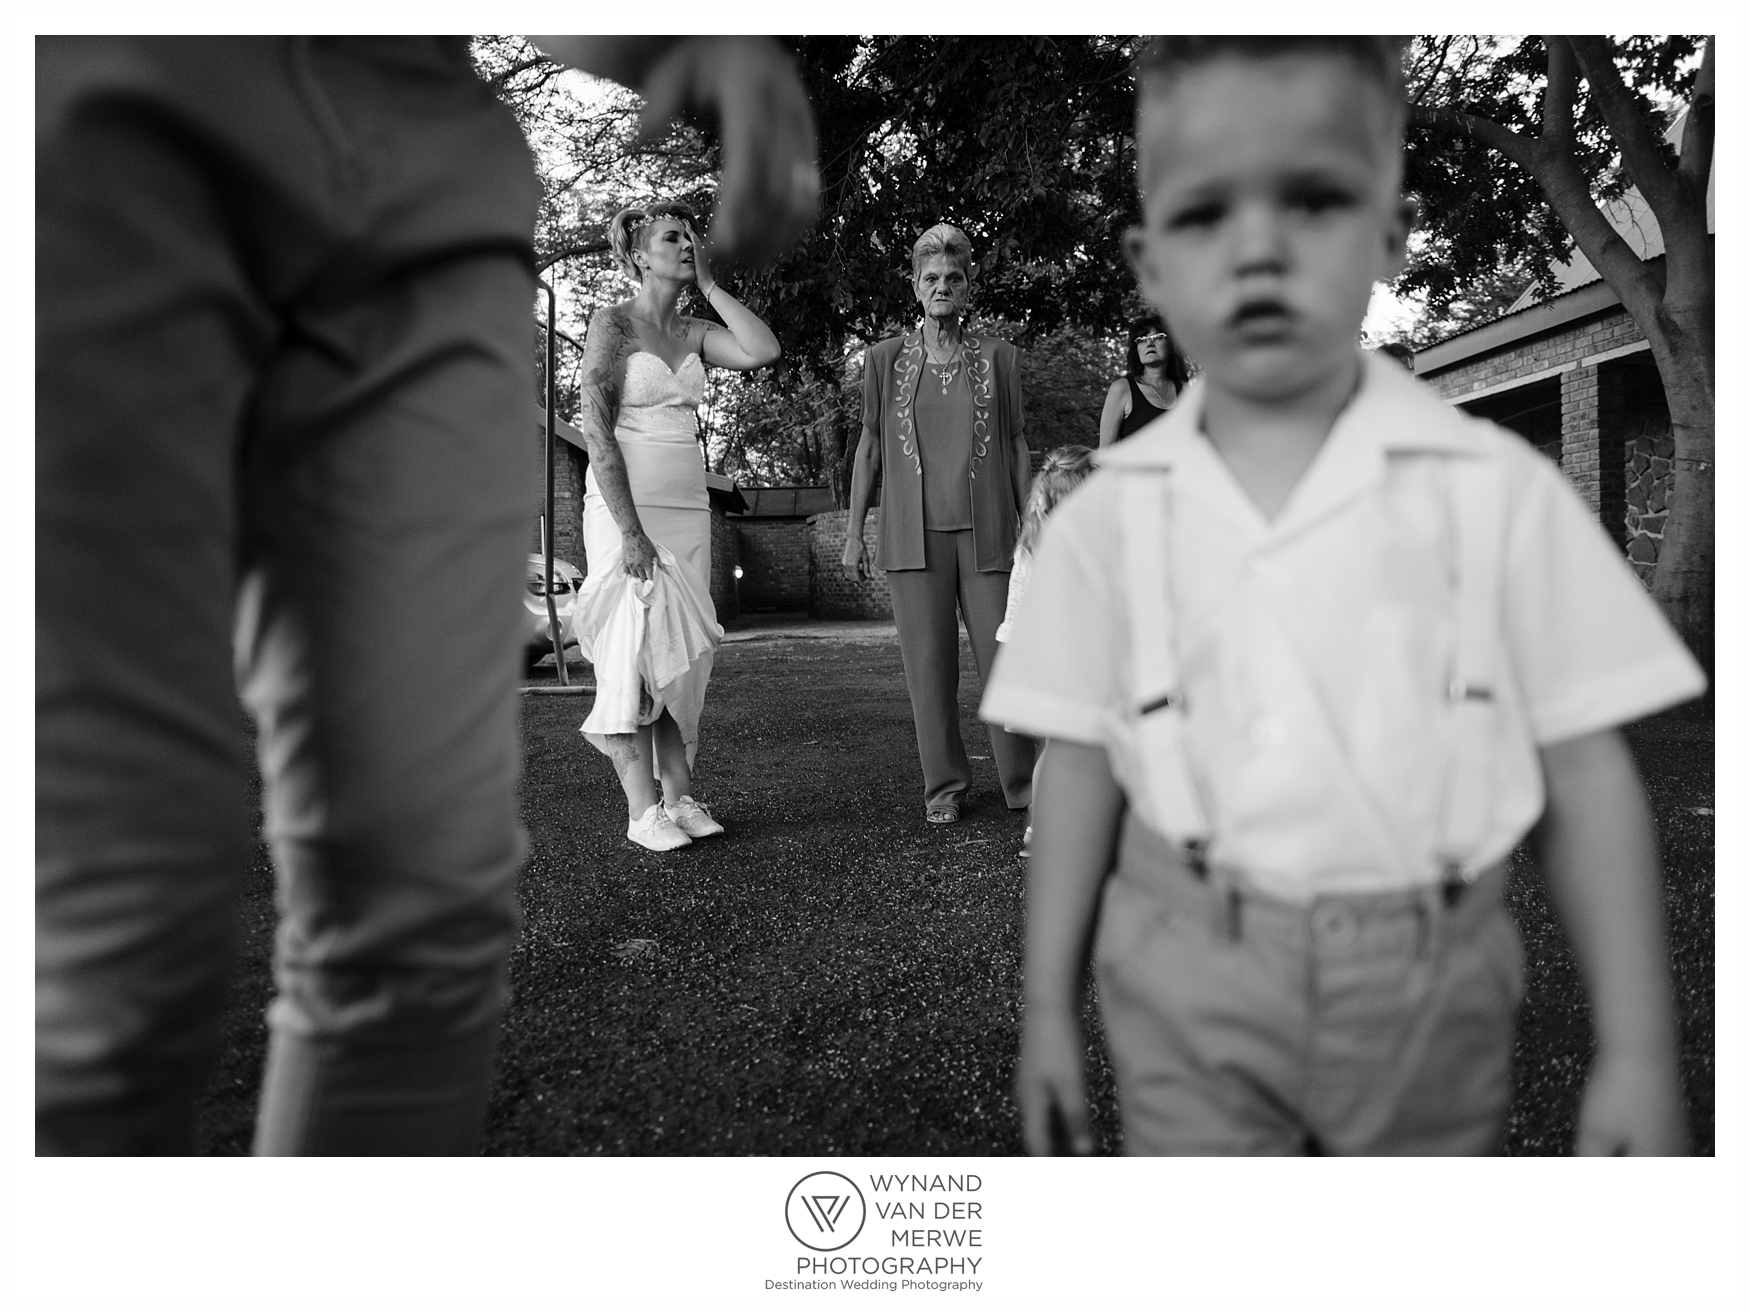 WynandvanderMerwe_weddingphotography_bushveldwedding_northam_bushveld_limpopowedding_limpopo_southafrica-300.jpg